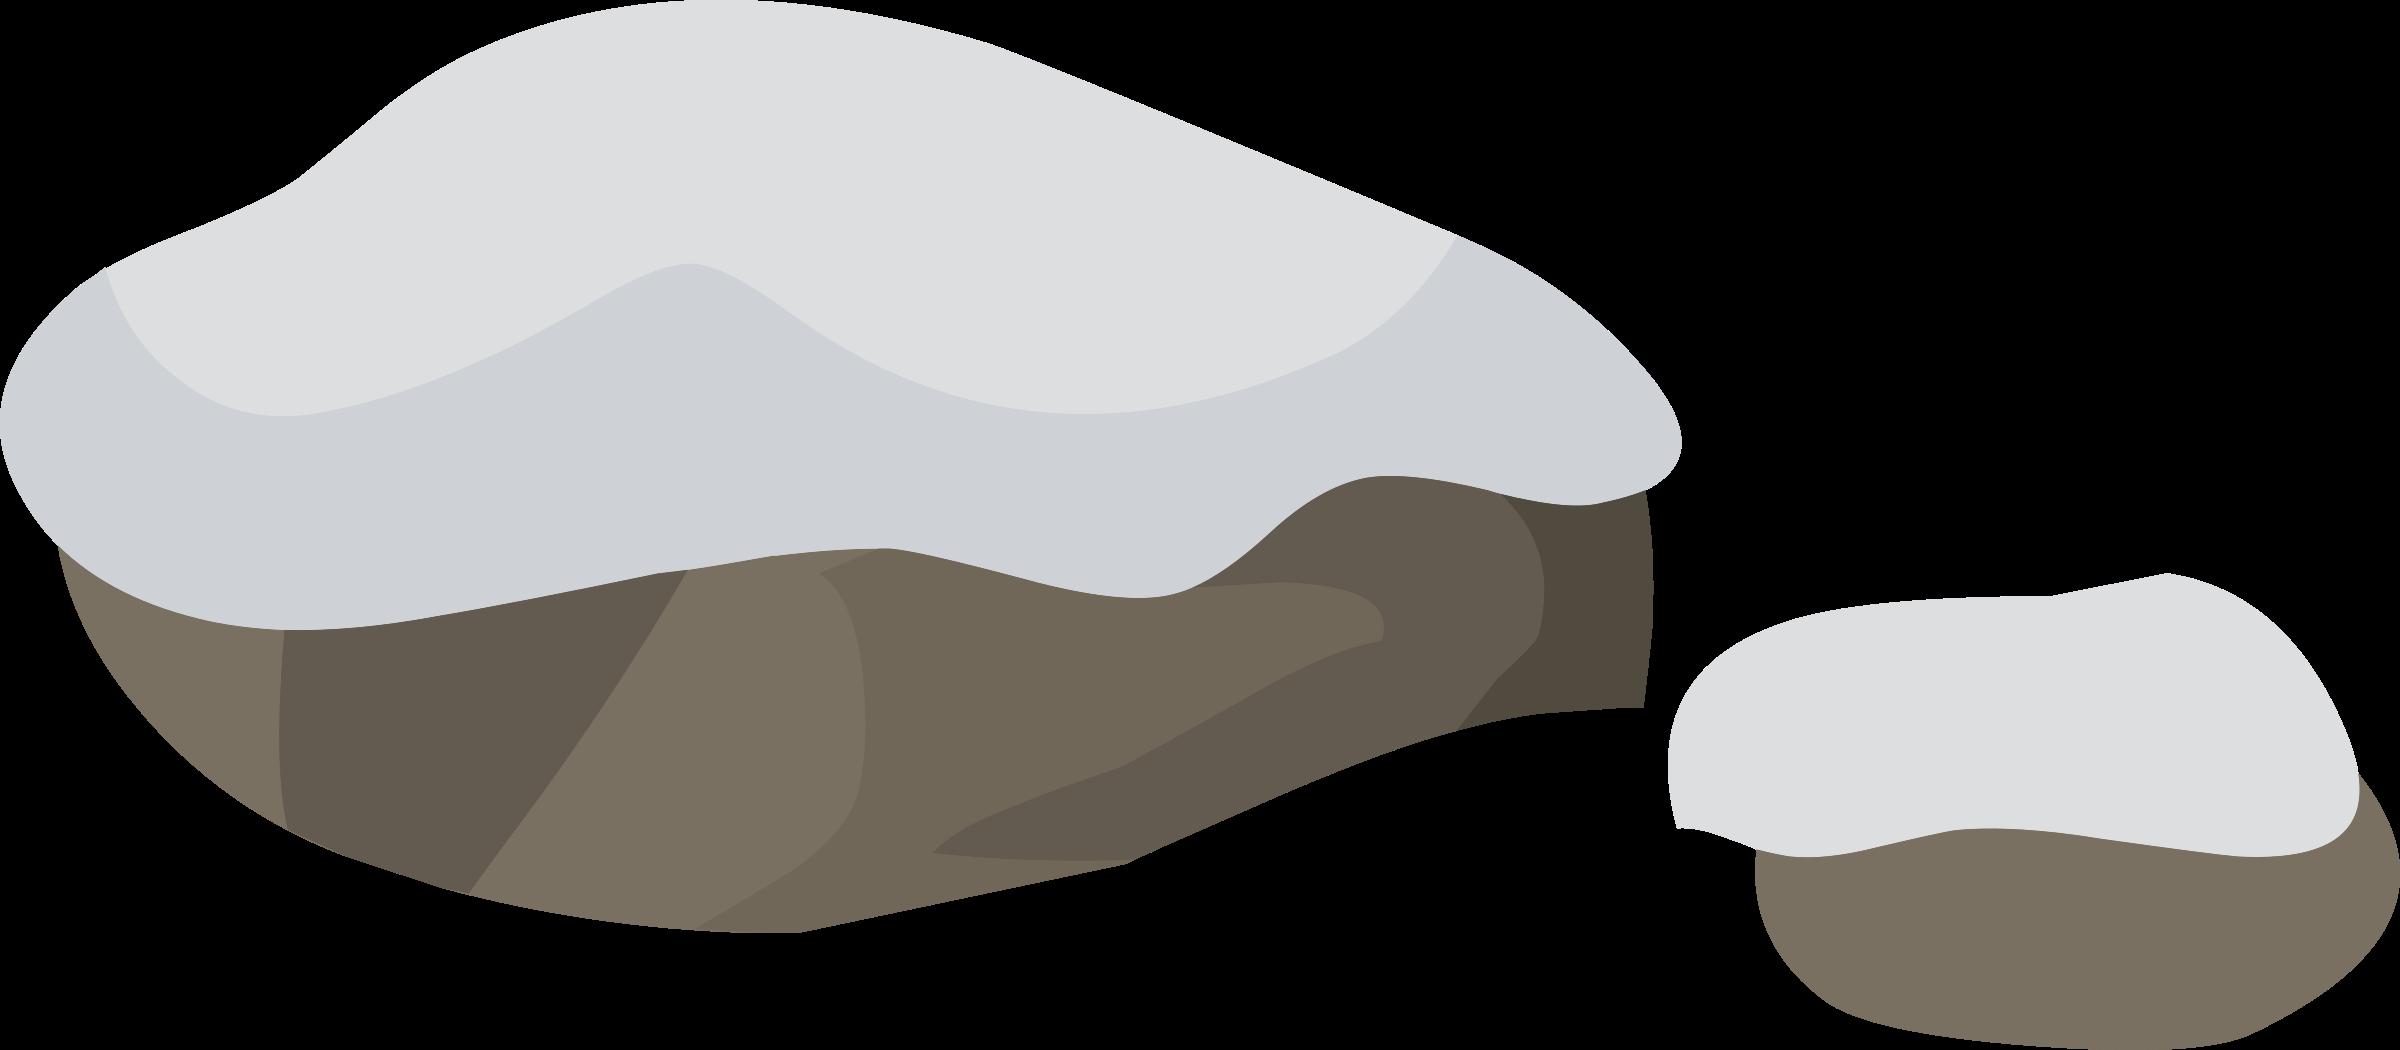 Drawing at getdrawings com. Clipart rock rock cliff